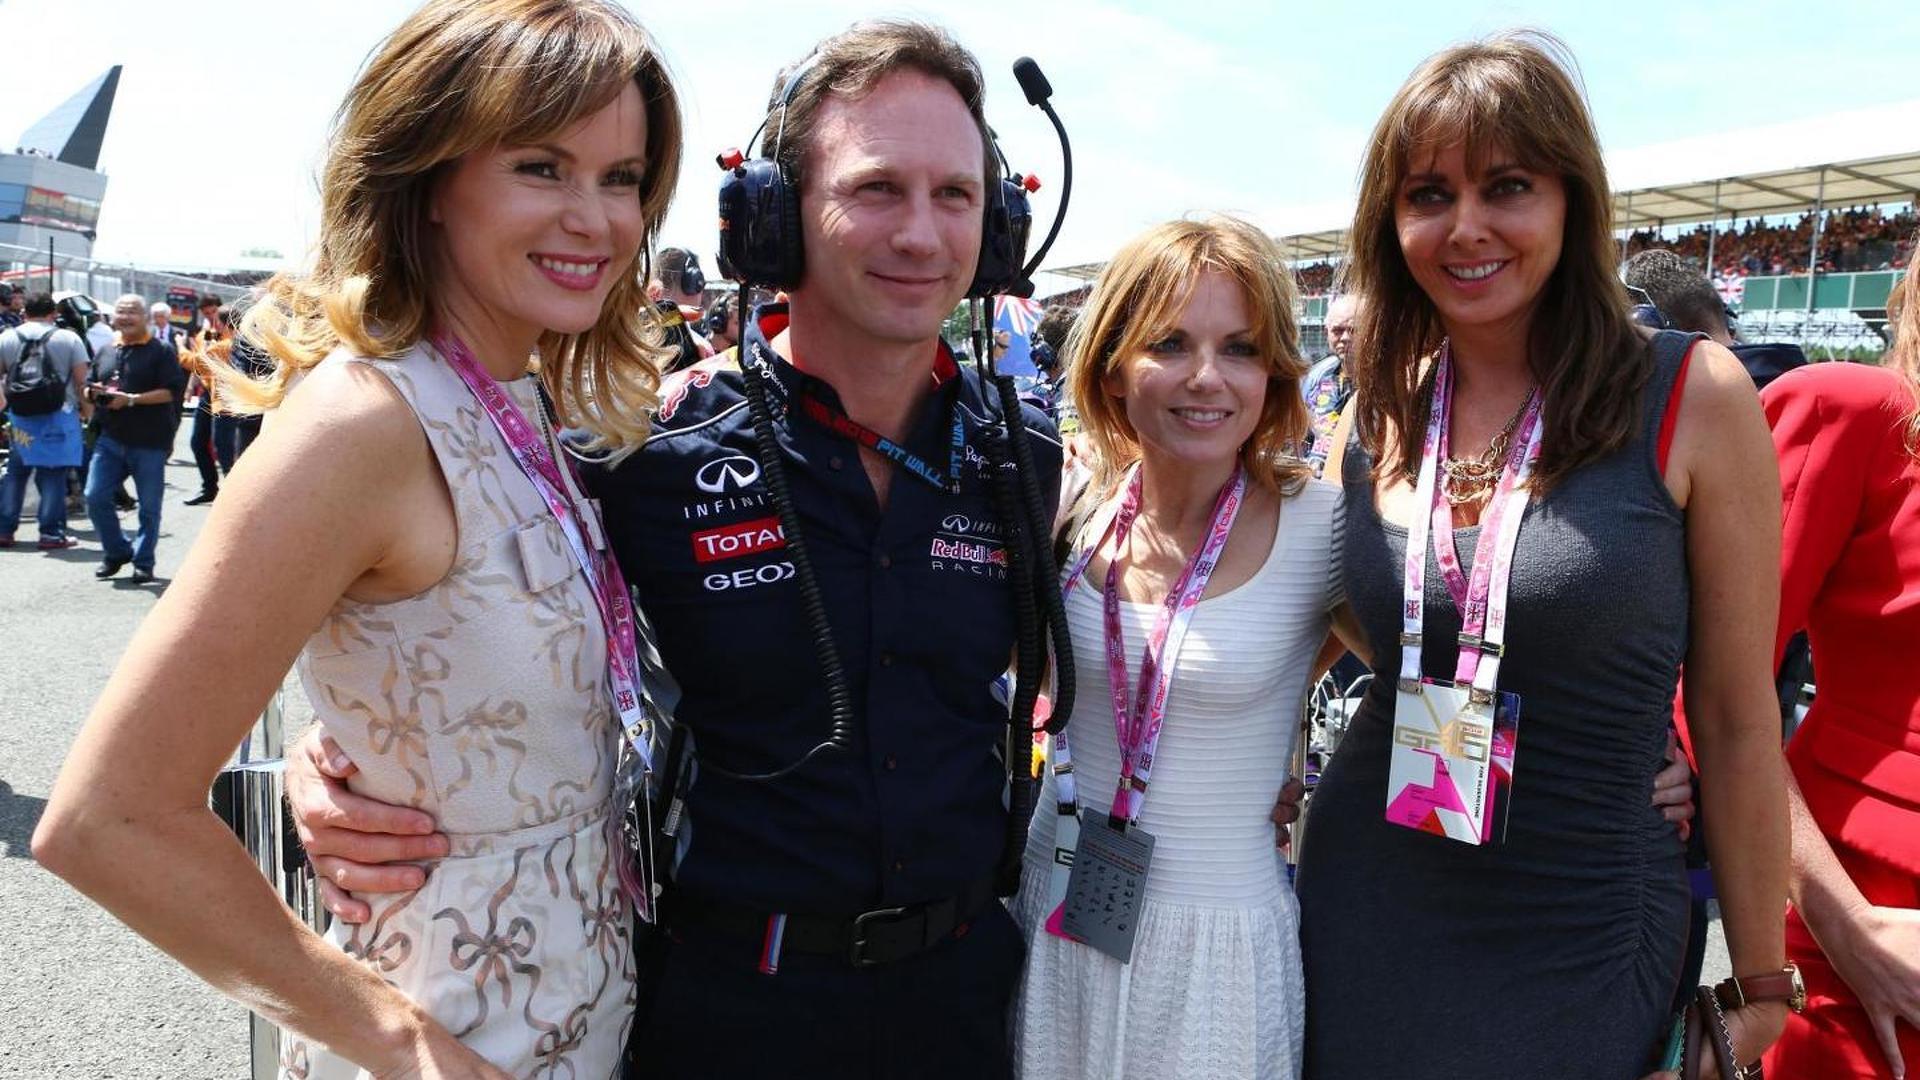 Next challenge is fatherhood for F1's Horner